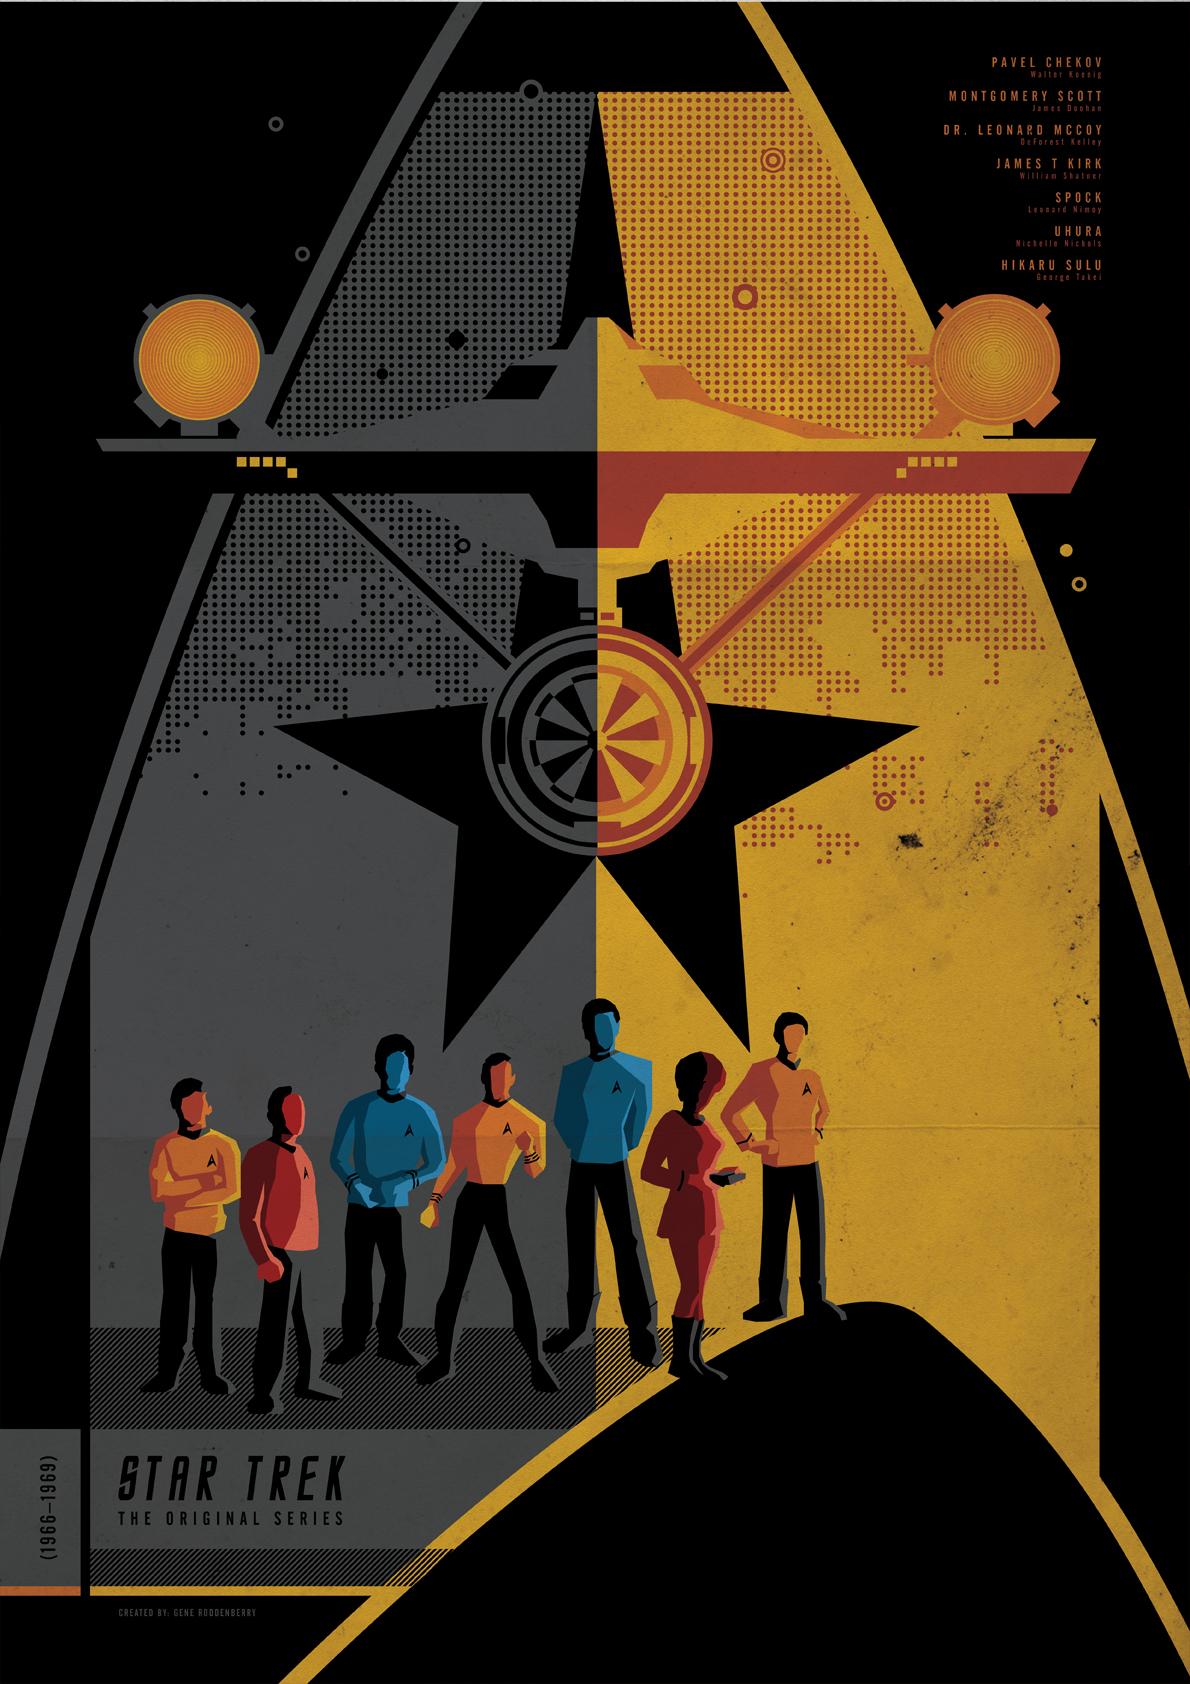 Star Trek Iphone X Wallpaper Star Trek All Characters Bensmind